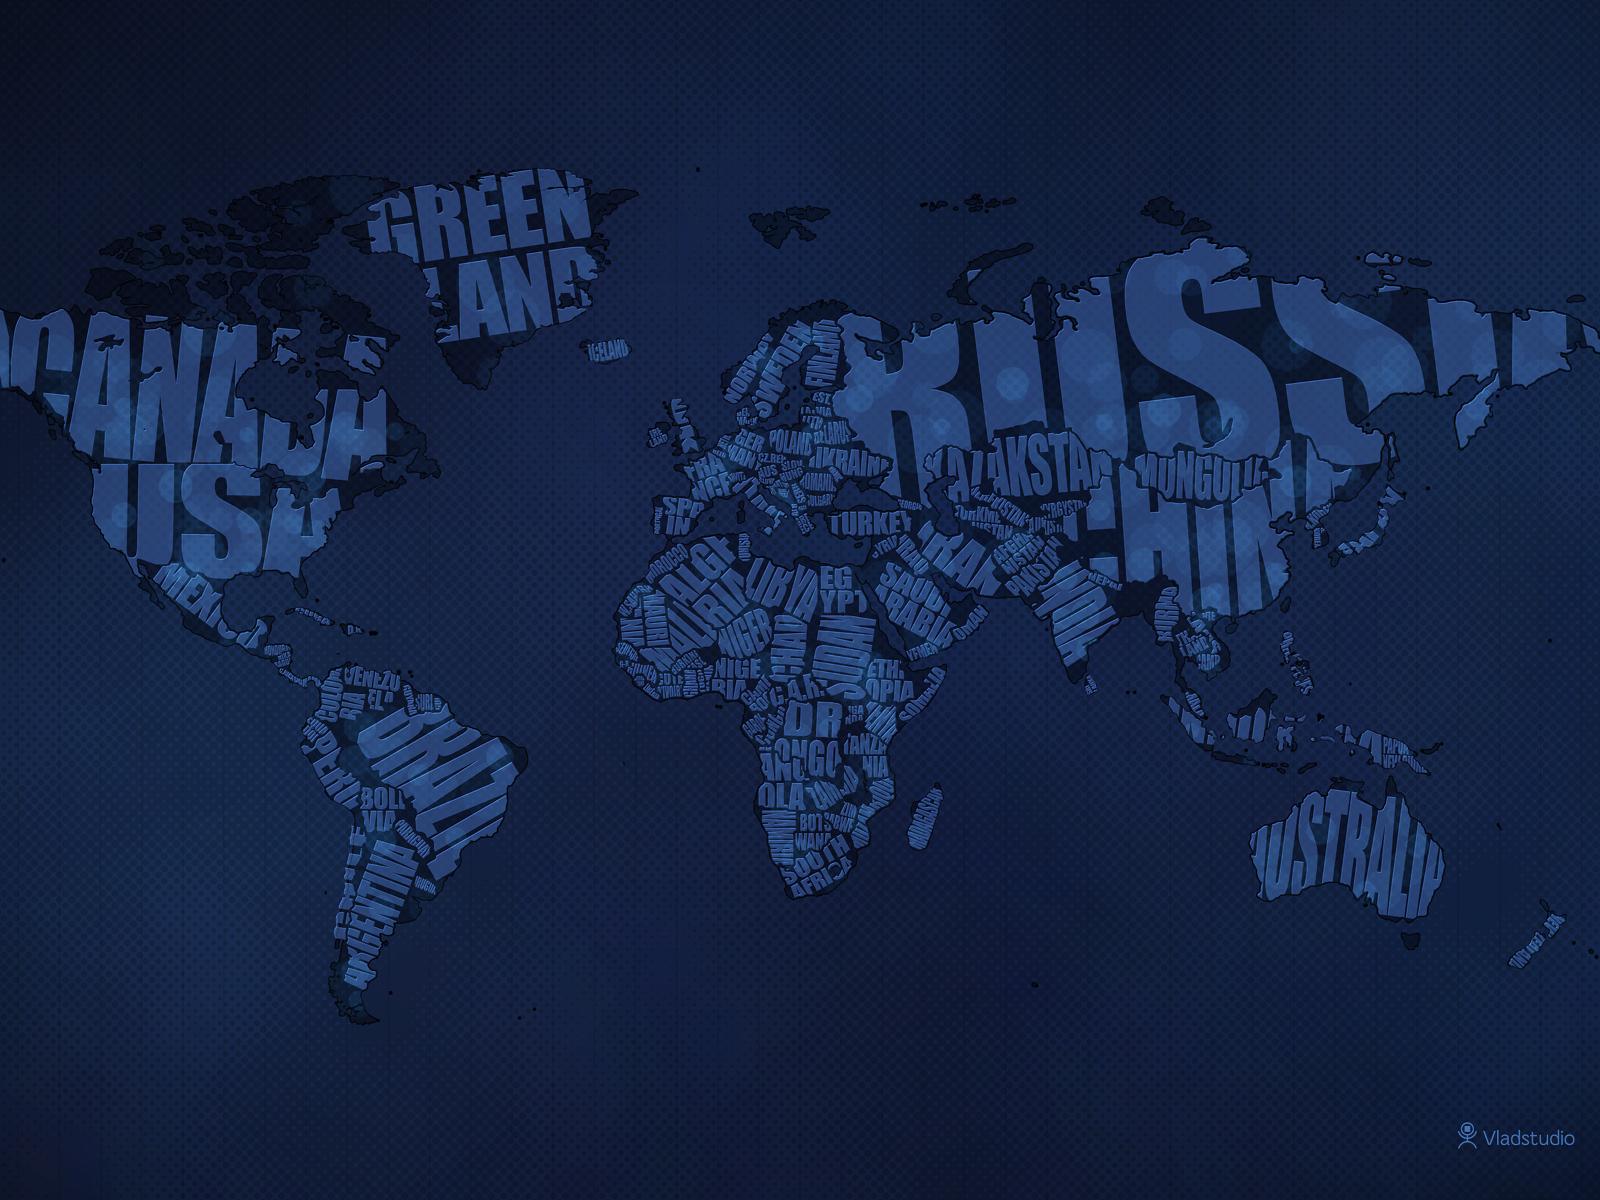 vladstudio_typographic_world_map_dark_1600x1200.jpg